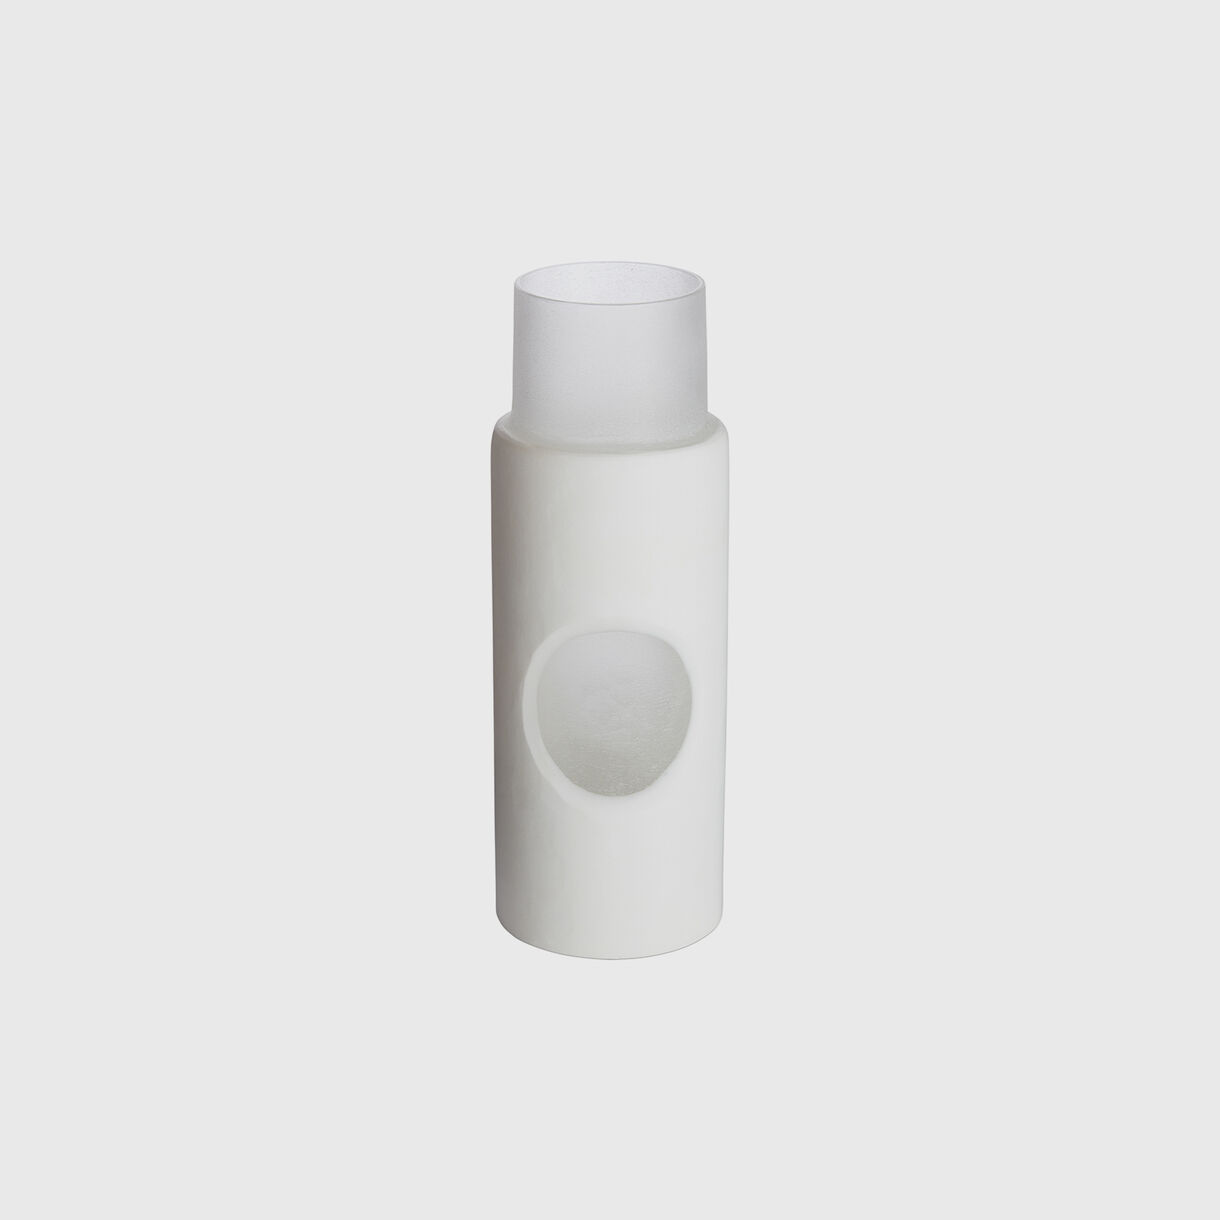 Carved Vase, Small, White